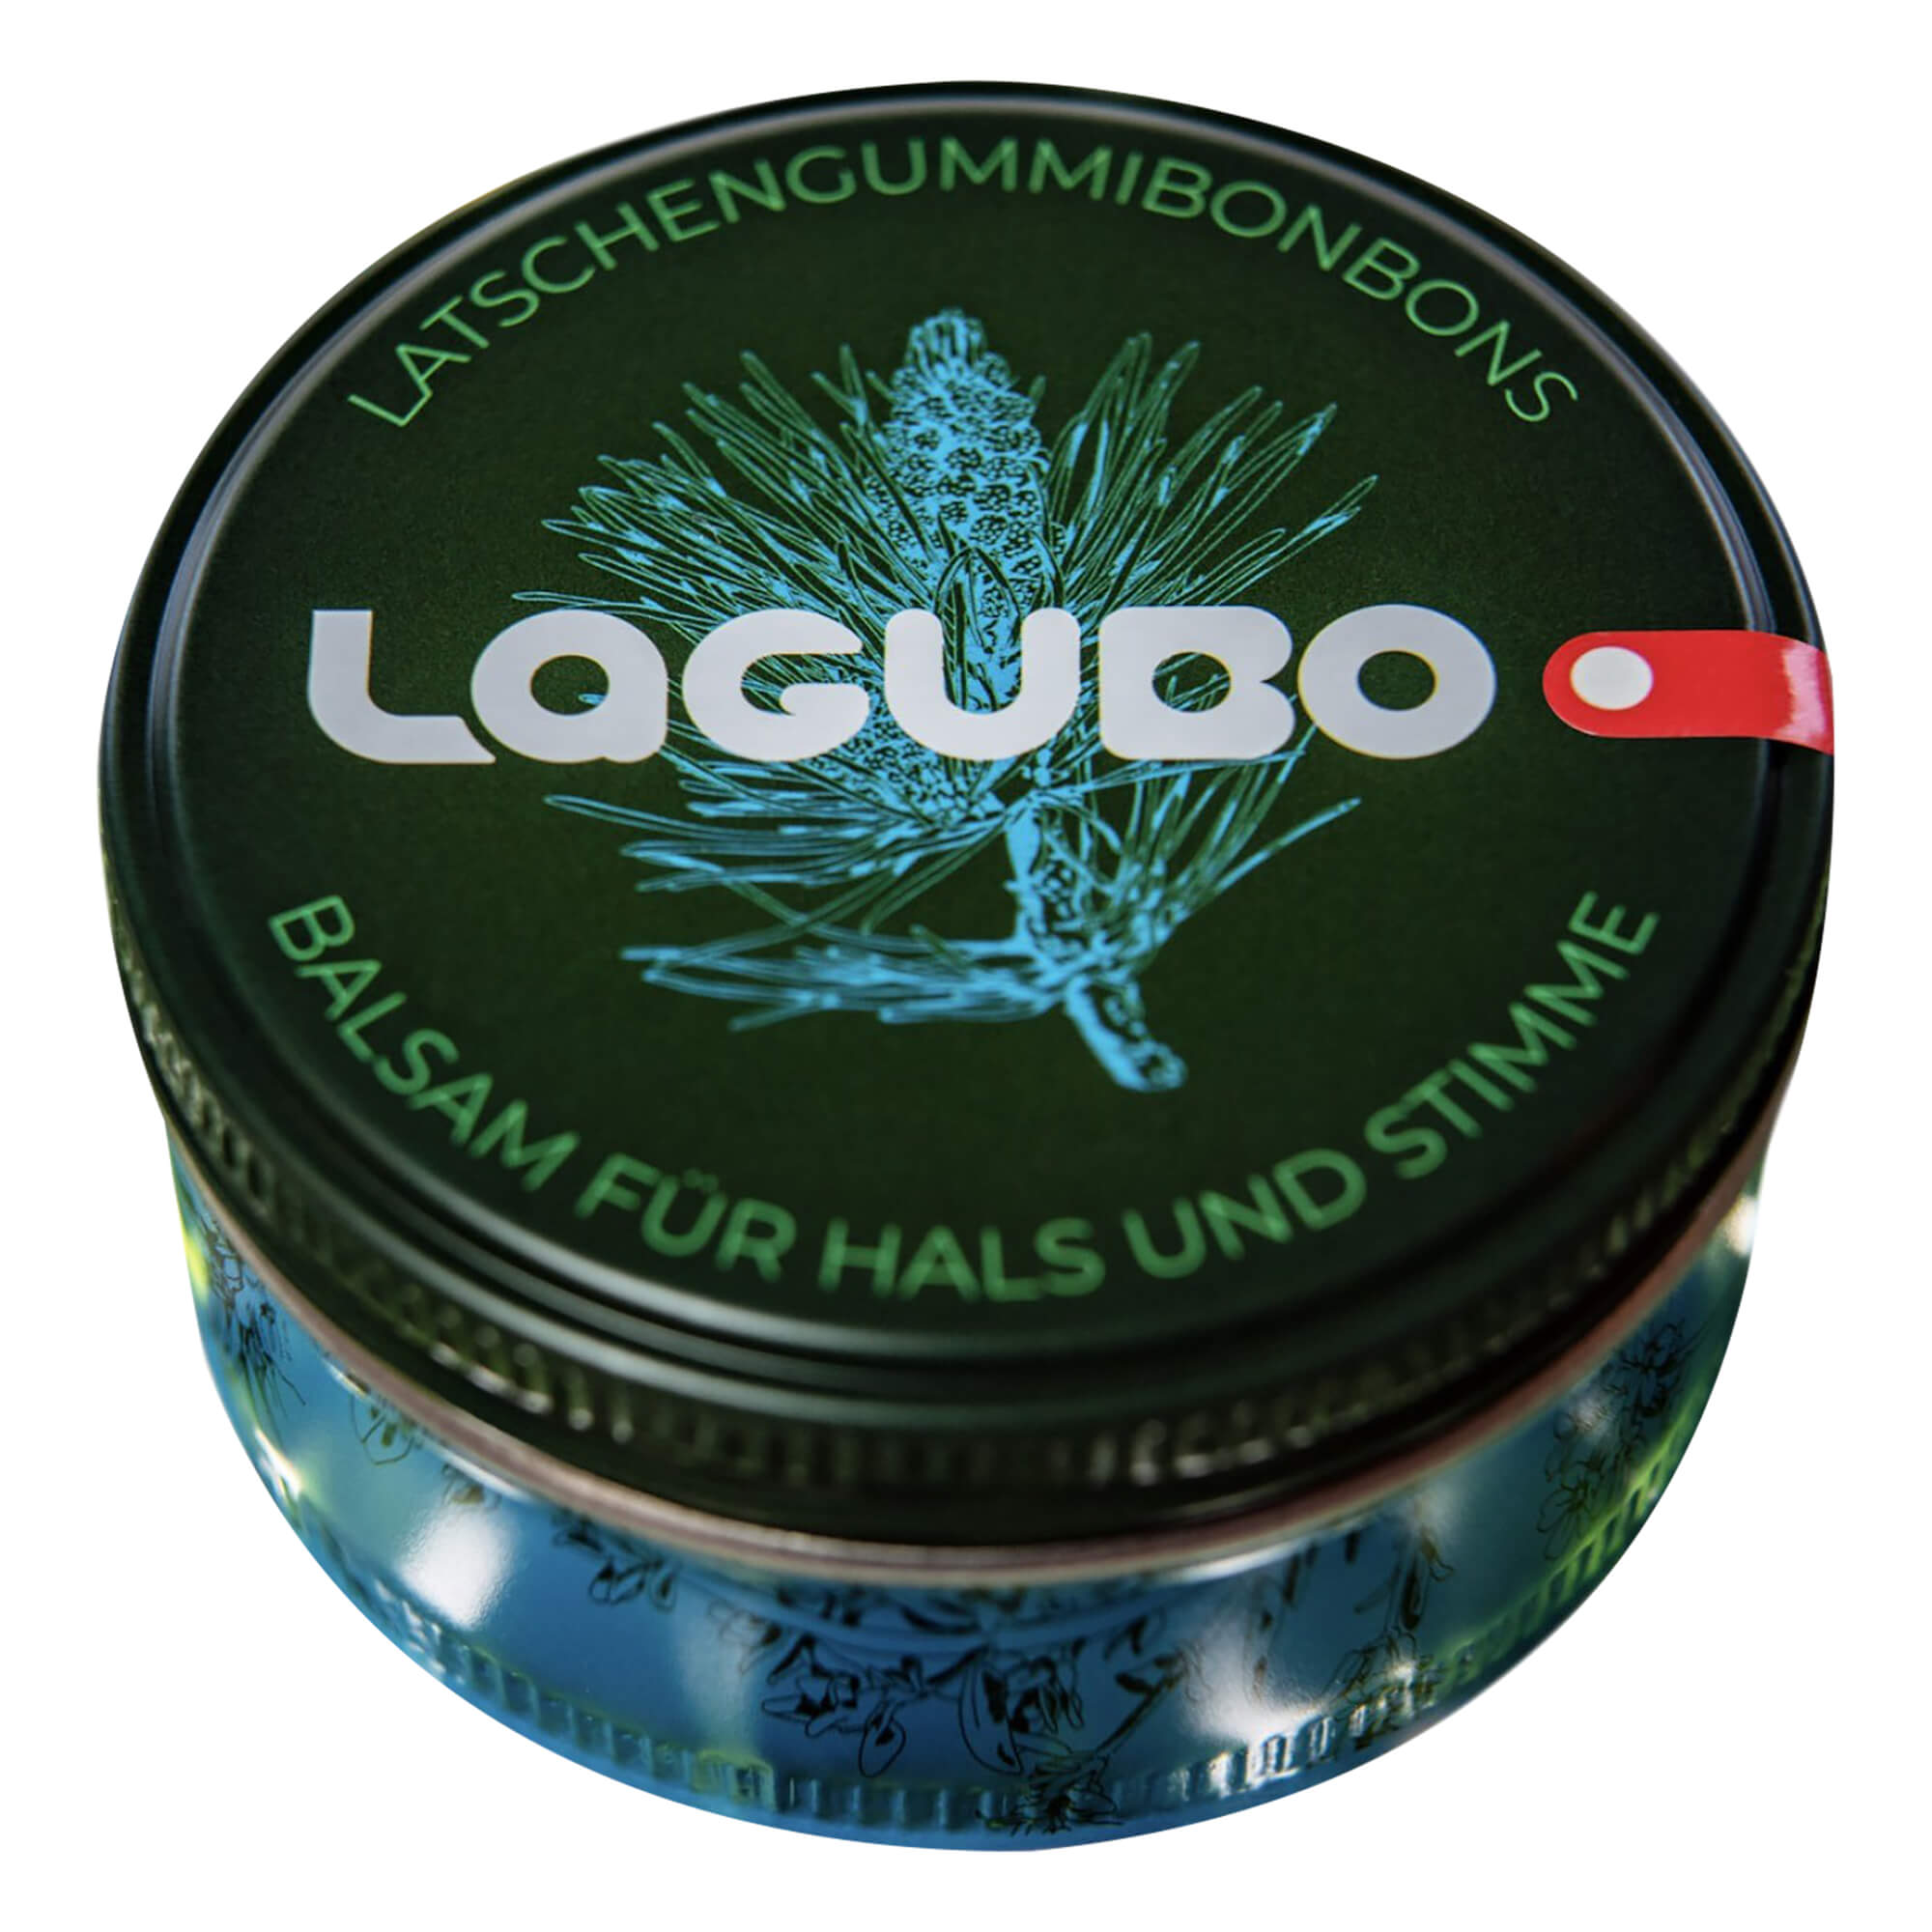 Lagubo Latschengummibonbons